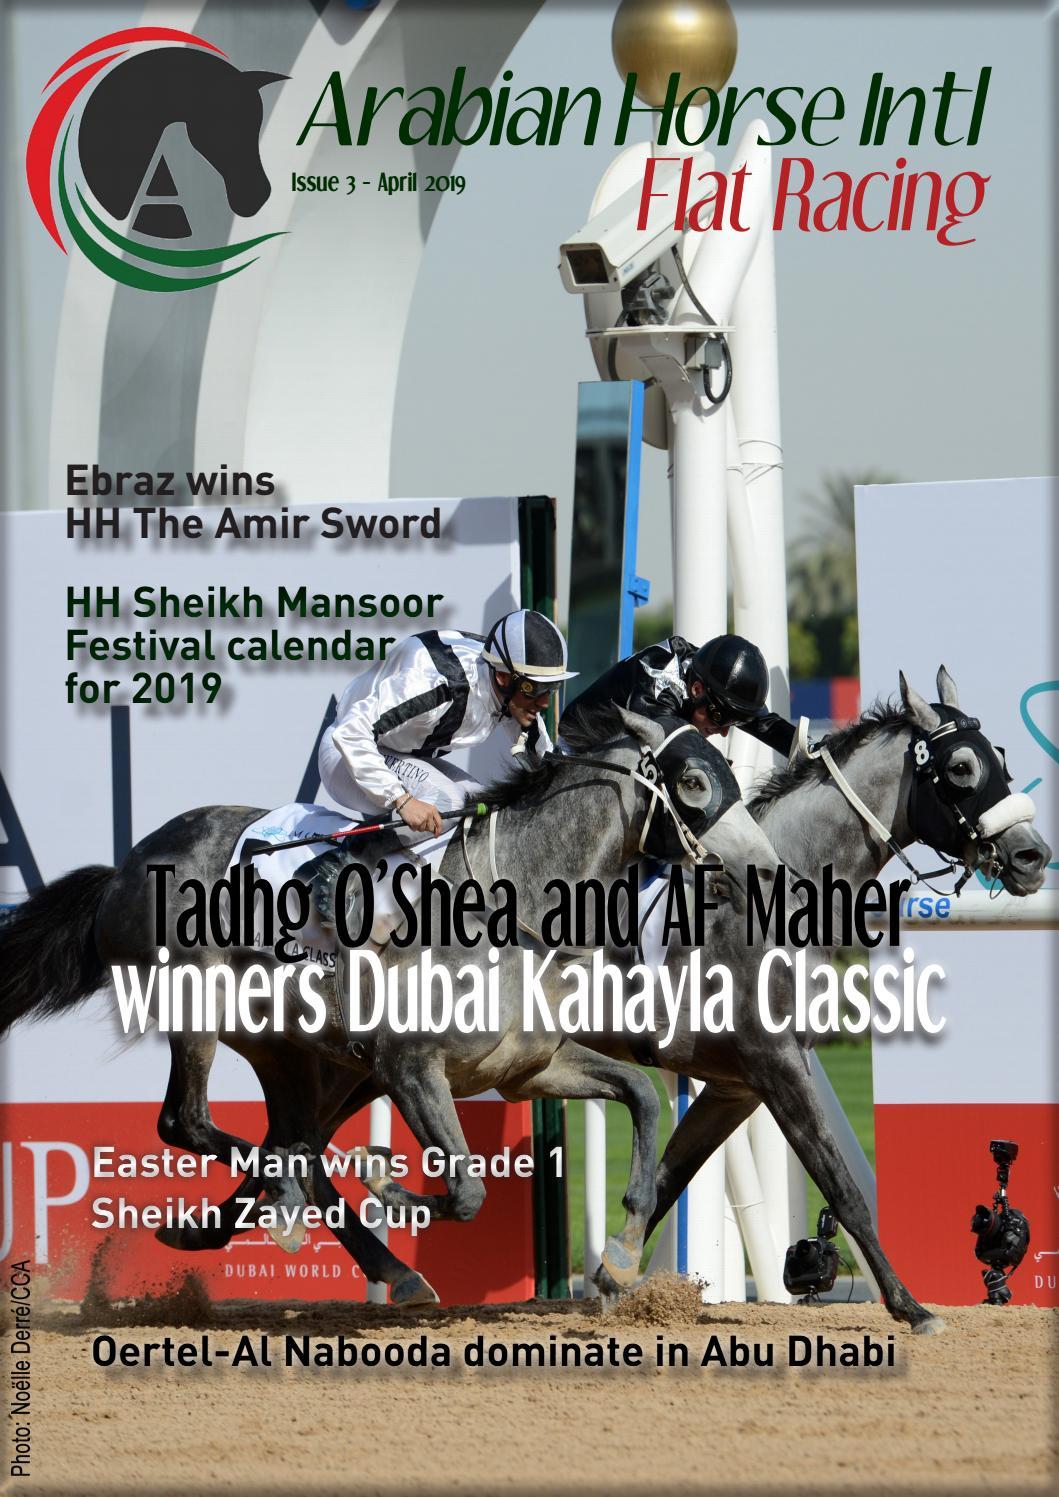 Arabian Horse Intl Flat Racing Issue 3 By Arabianhorseintl Issuu